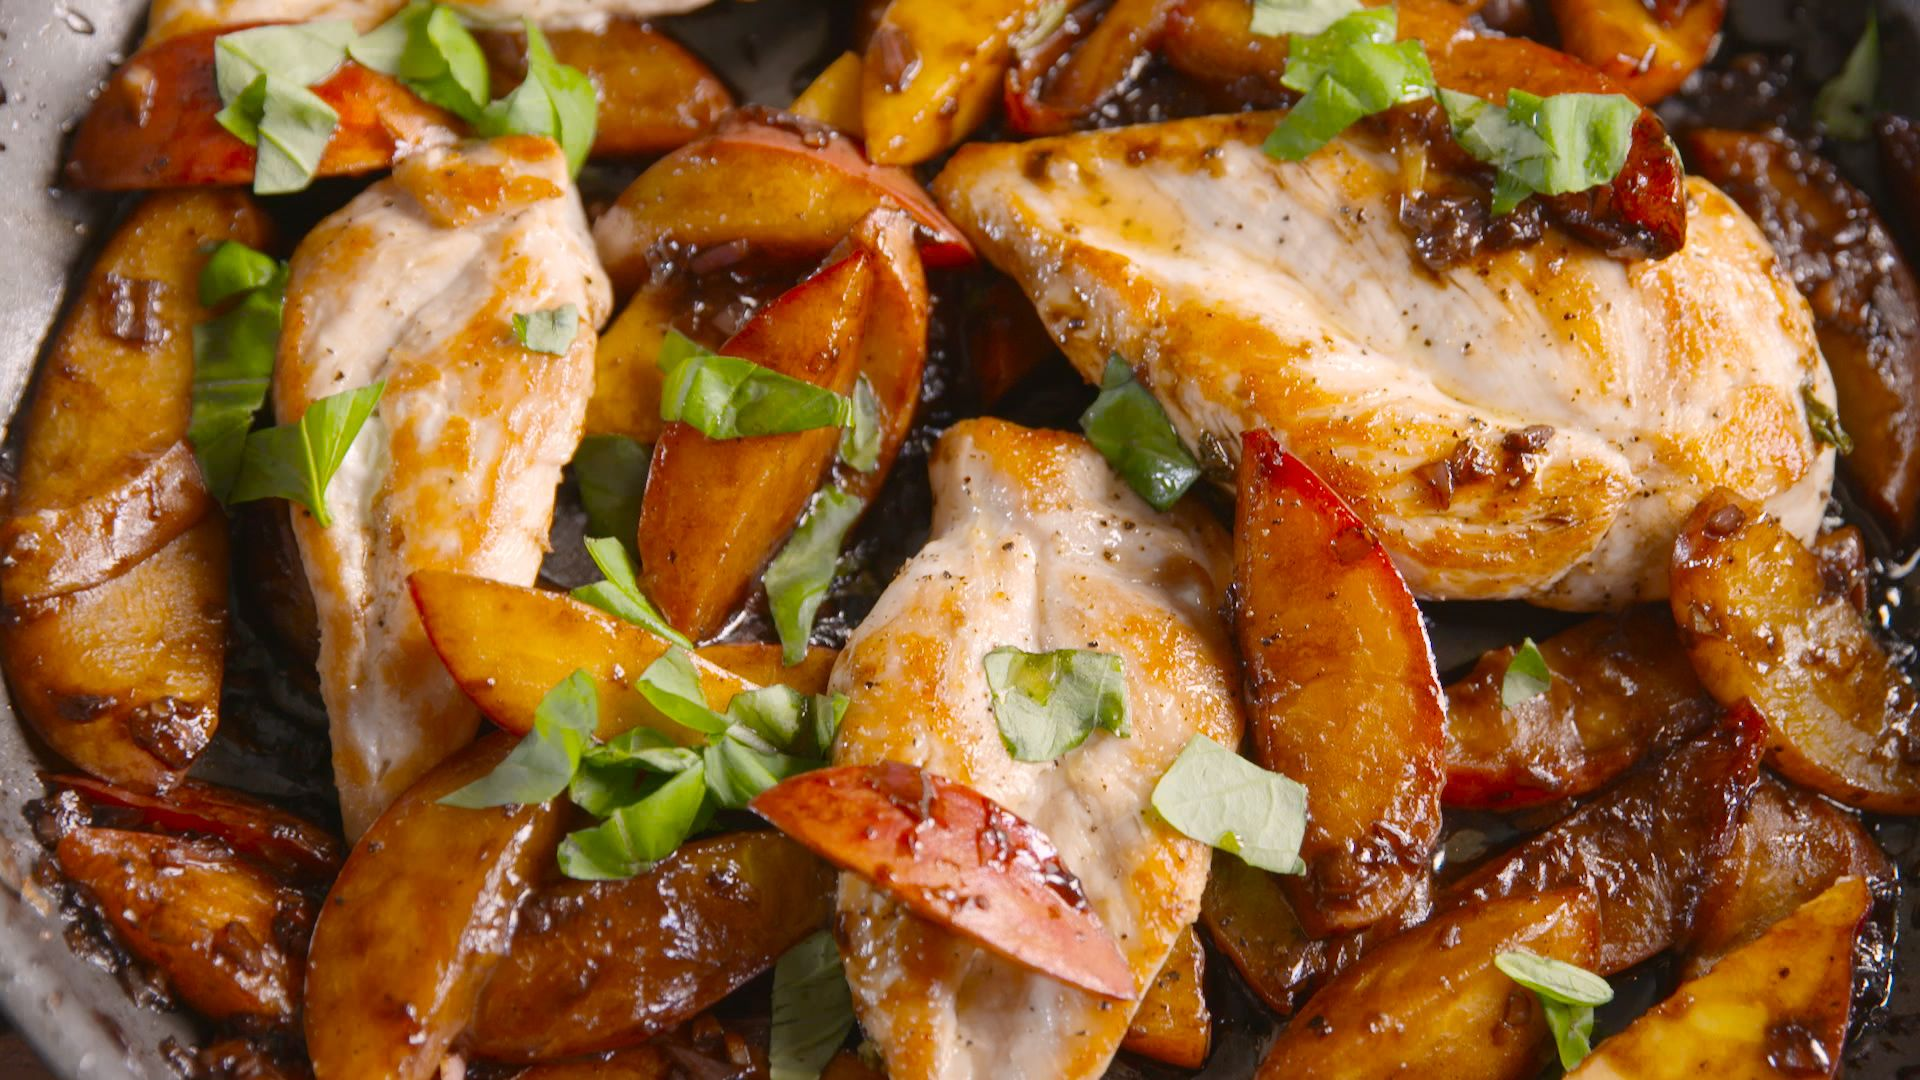 Best Peach Balsamic Chicken Recipe How To Make Peach Balsamic Chicken